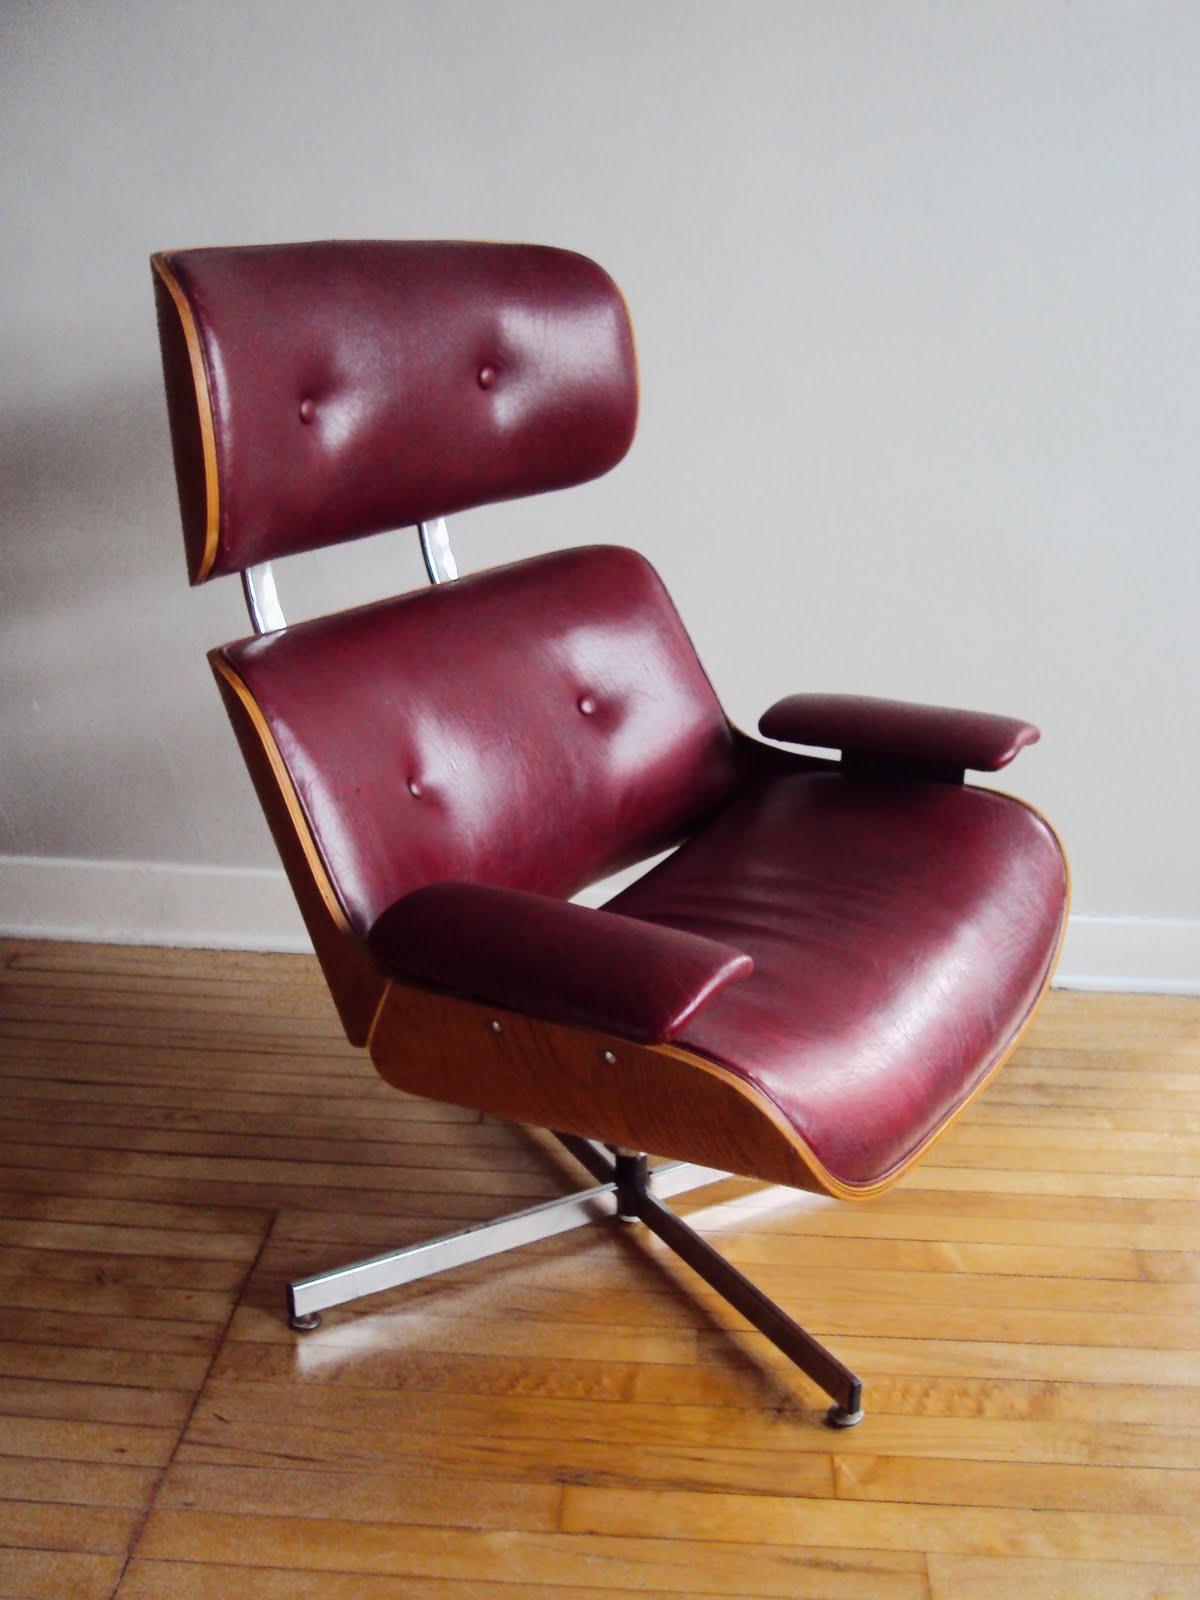 selig eames chair graco adjustable high str8mcm december 2011